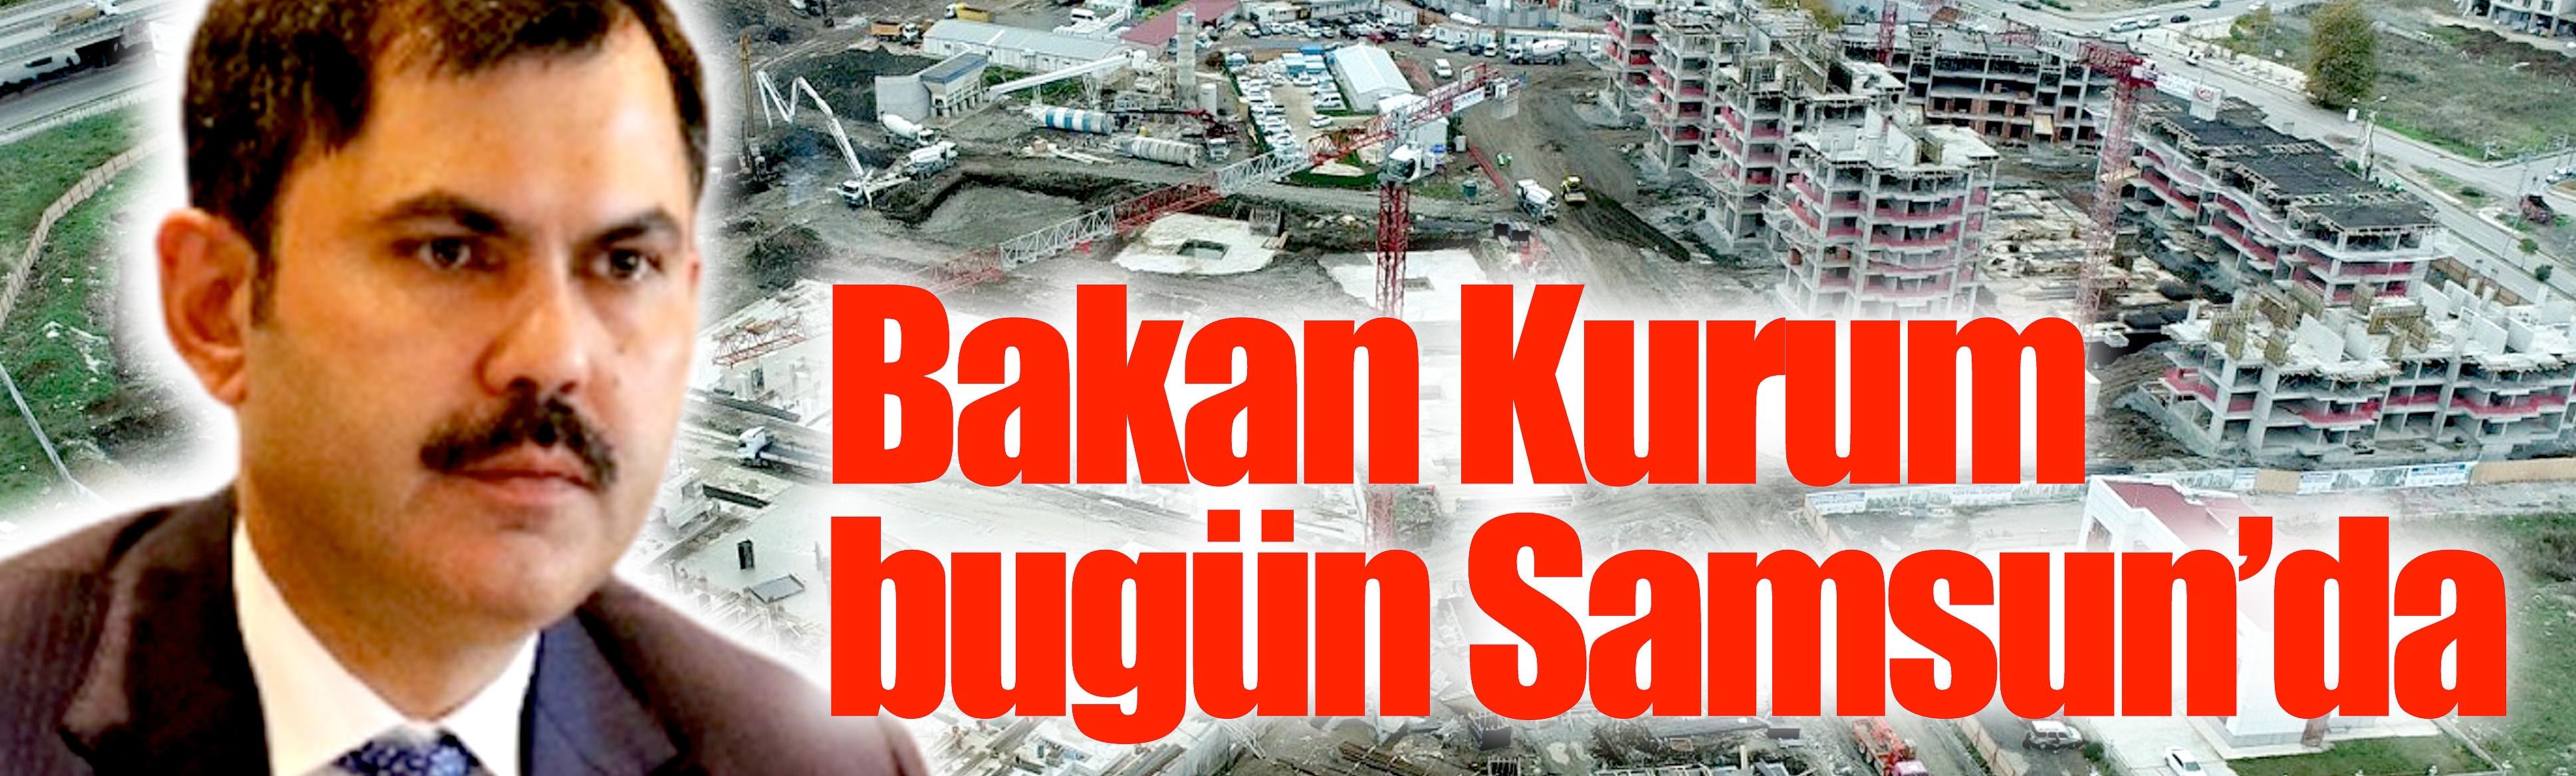 Bakan Kurum bugün Samsun'da